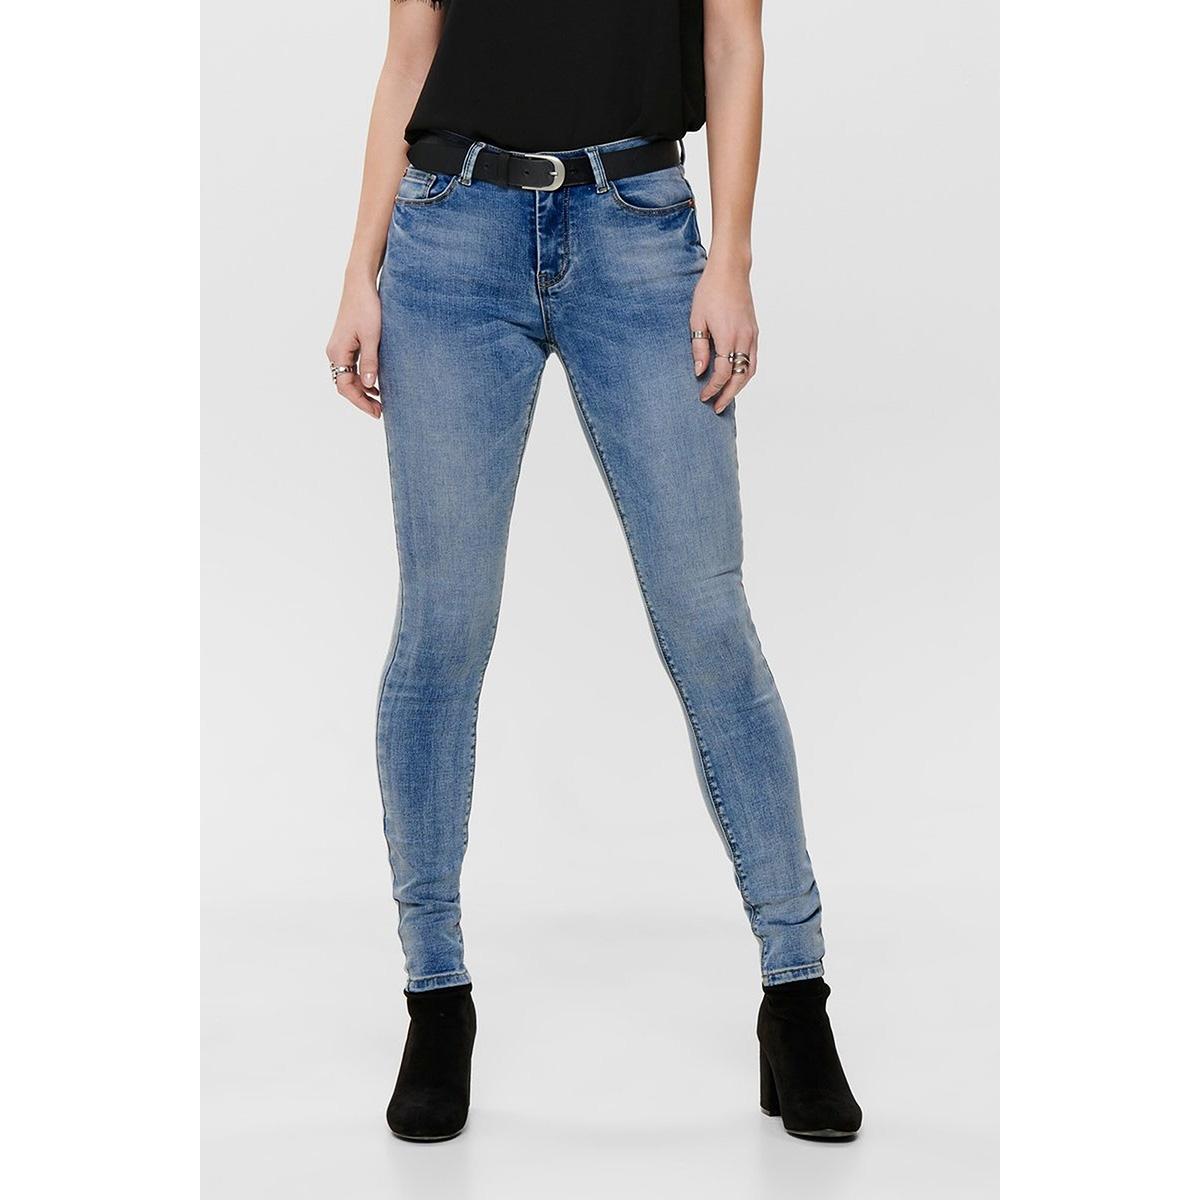 jdycarola skinny reg lb dnm 15193570 jacqueline de yong jeans light blue denim